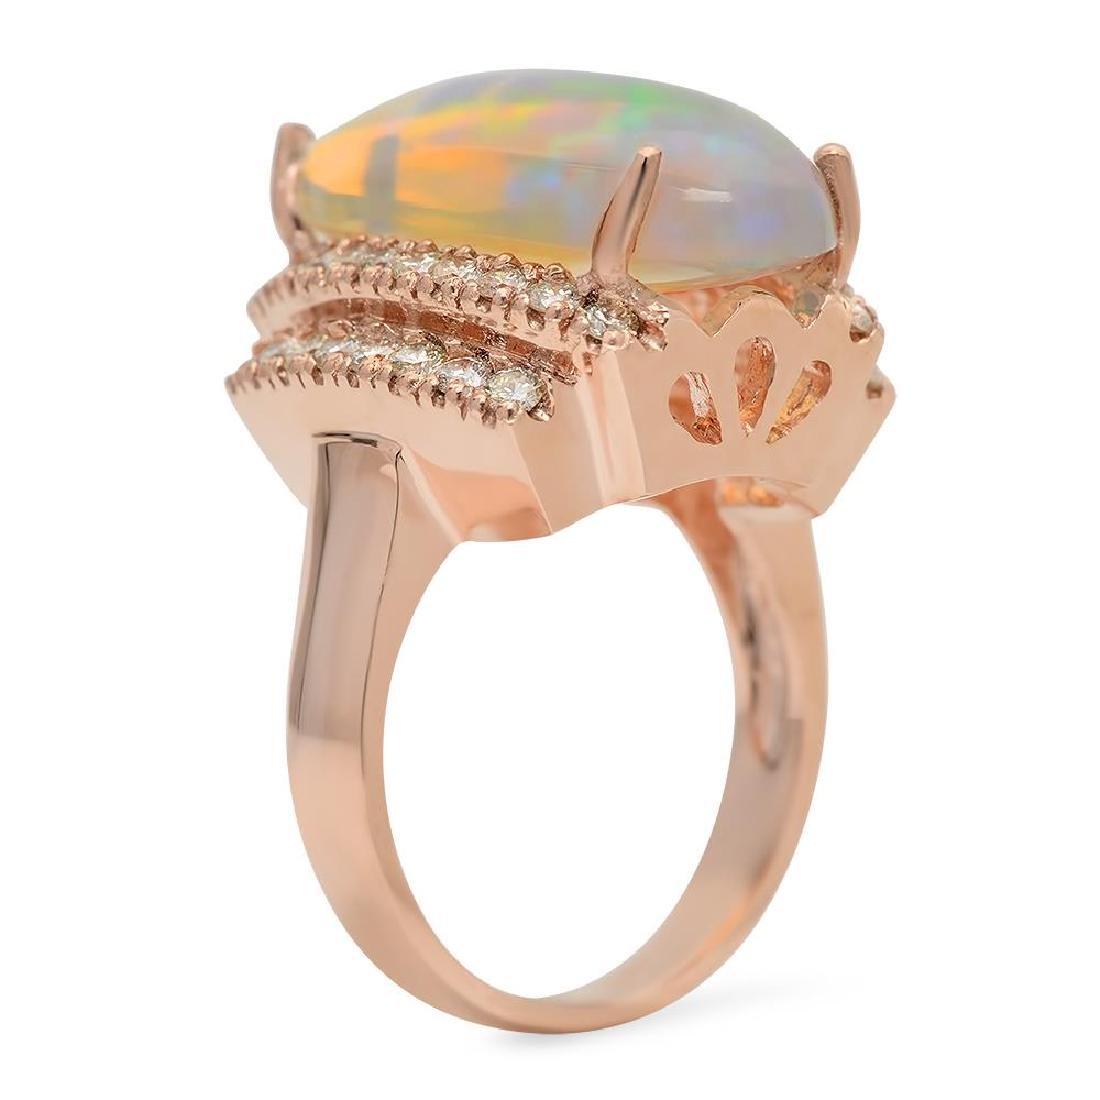 14K Gold 8.81ct Opal 1.10ct Diamond Ring - 2